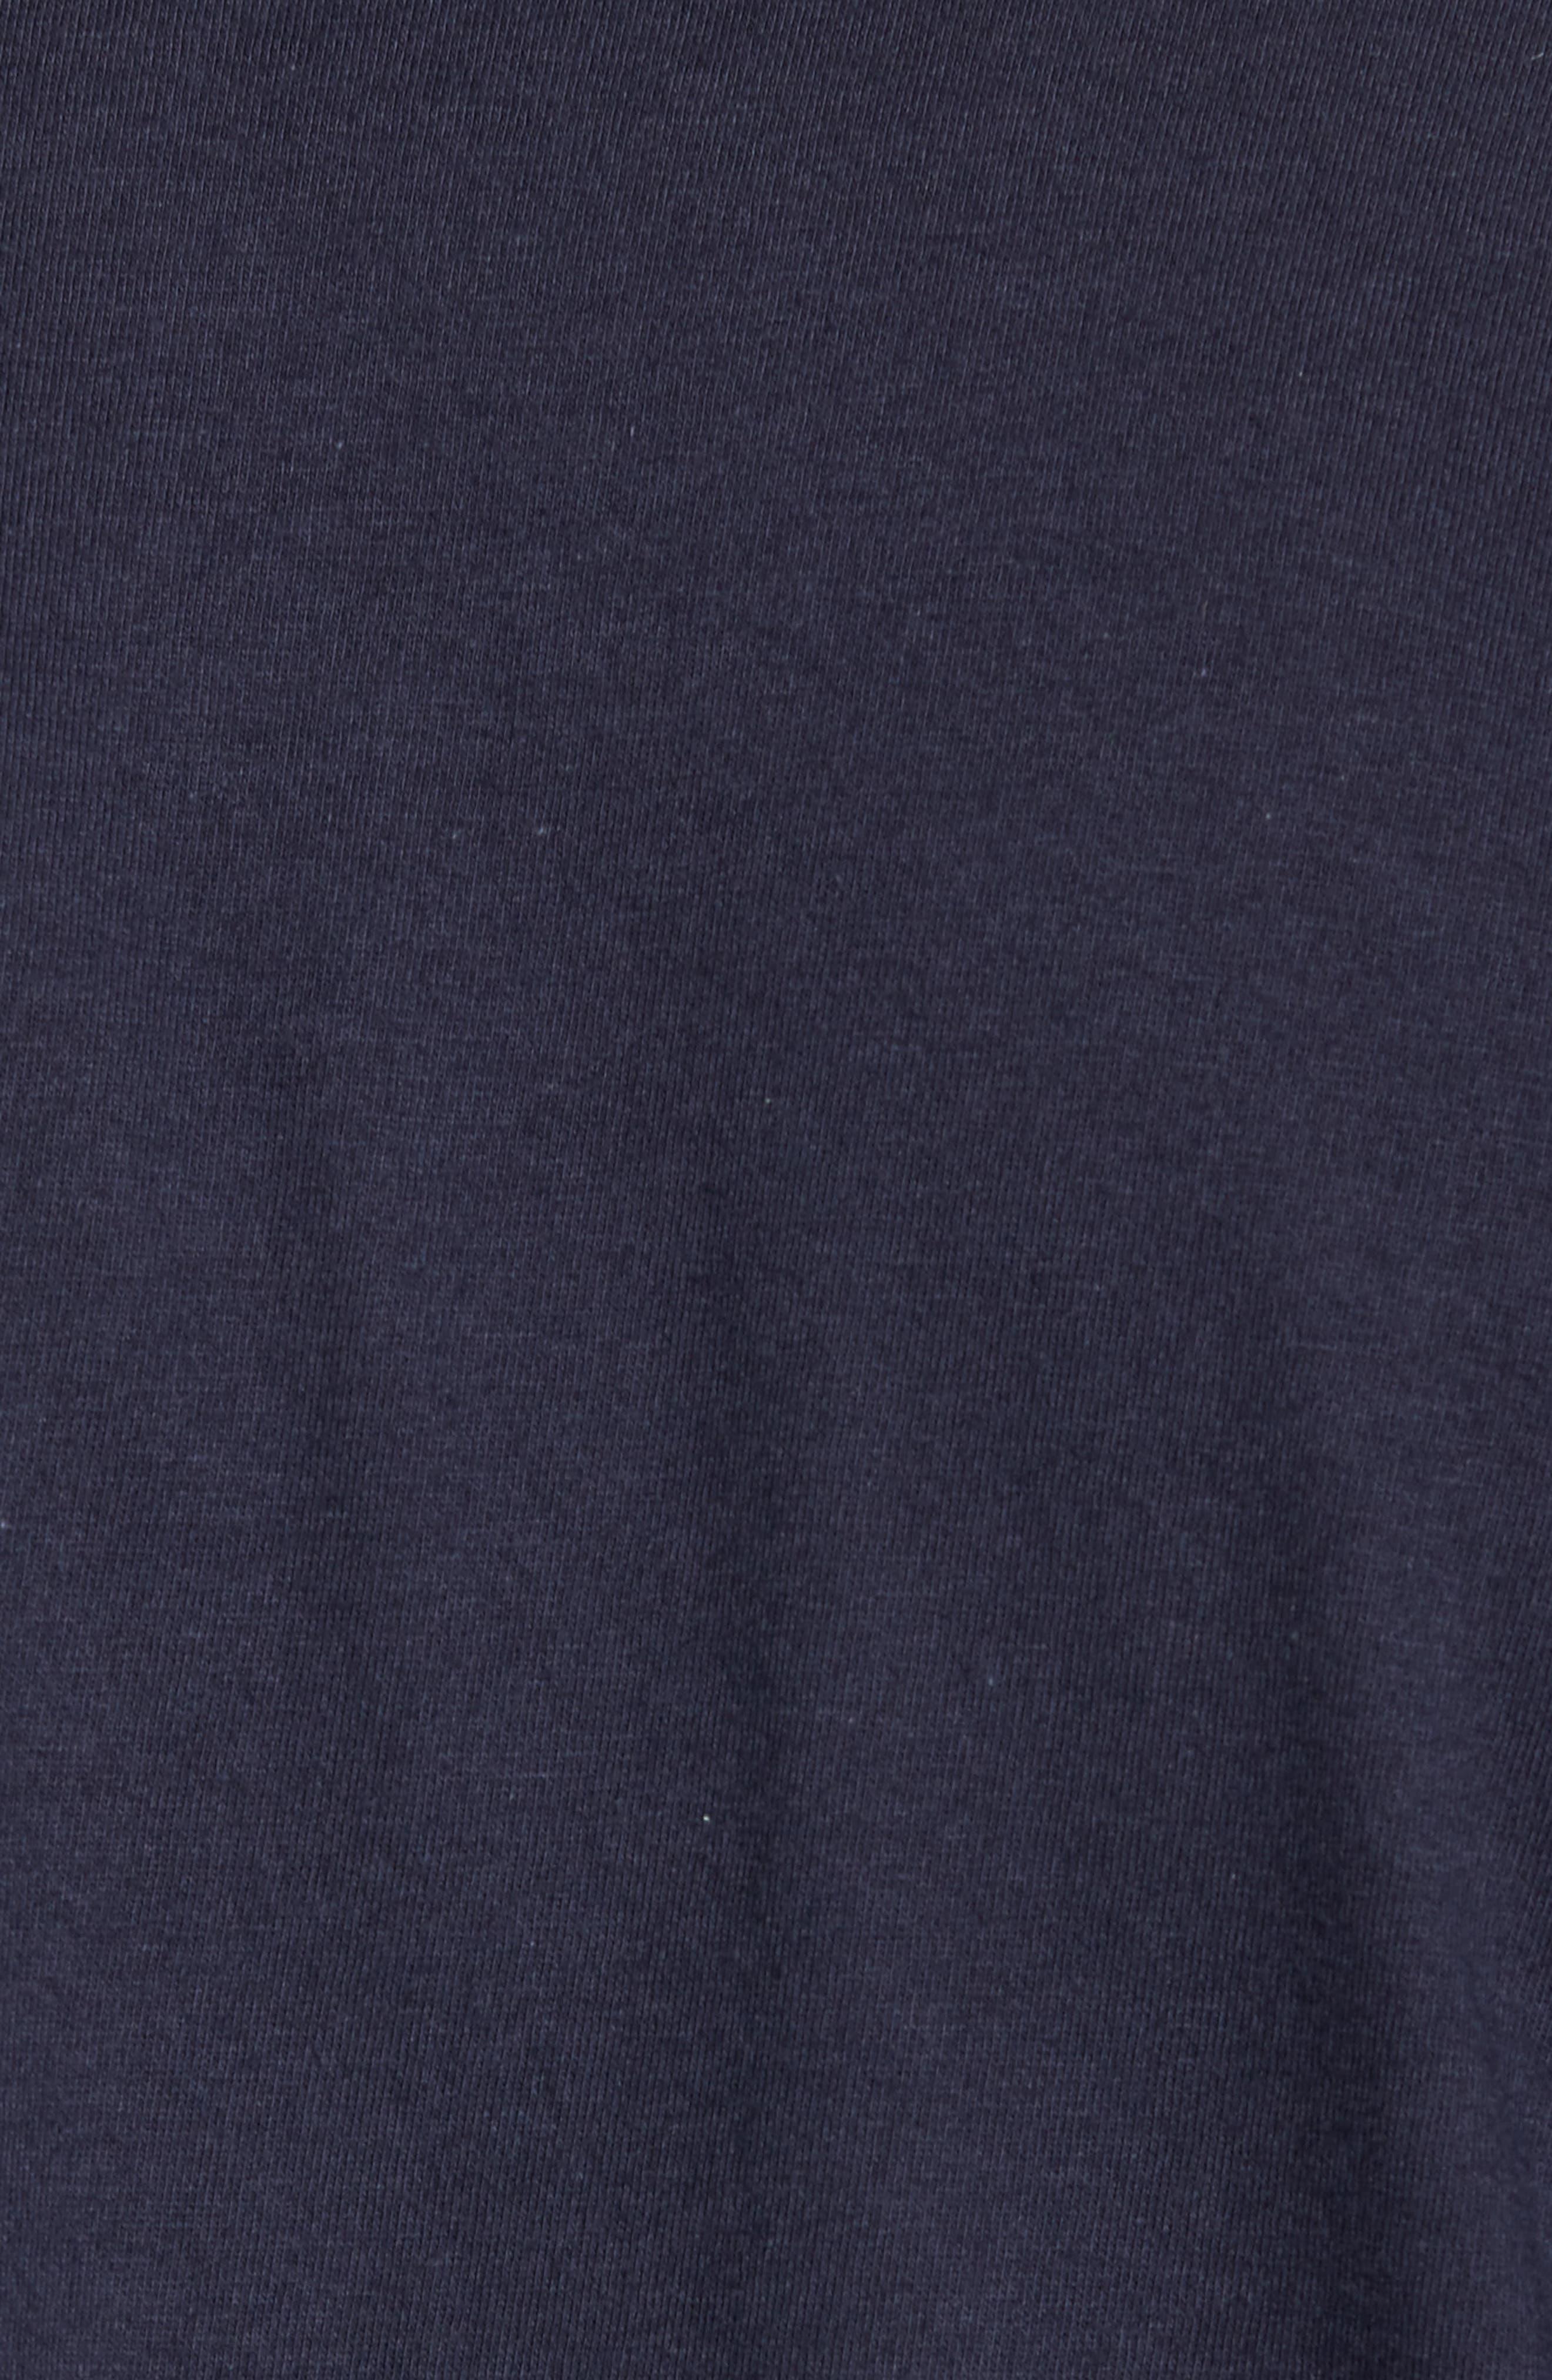 Johnny Tree Pool Graphic T-Shirt,                             Alternate thumbnail 5, color,                             411